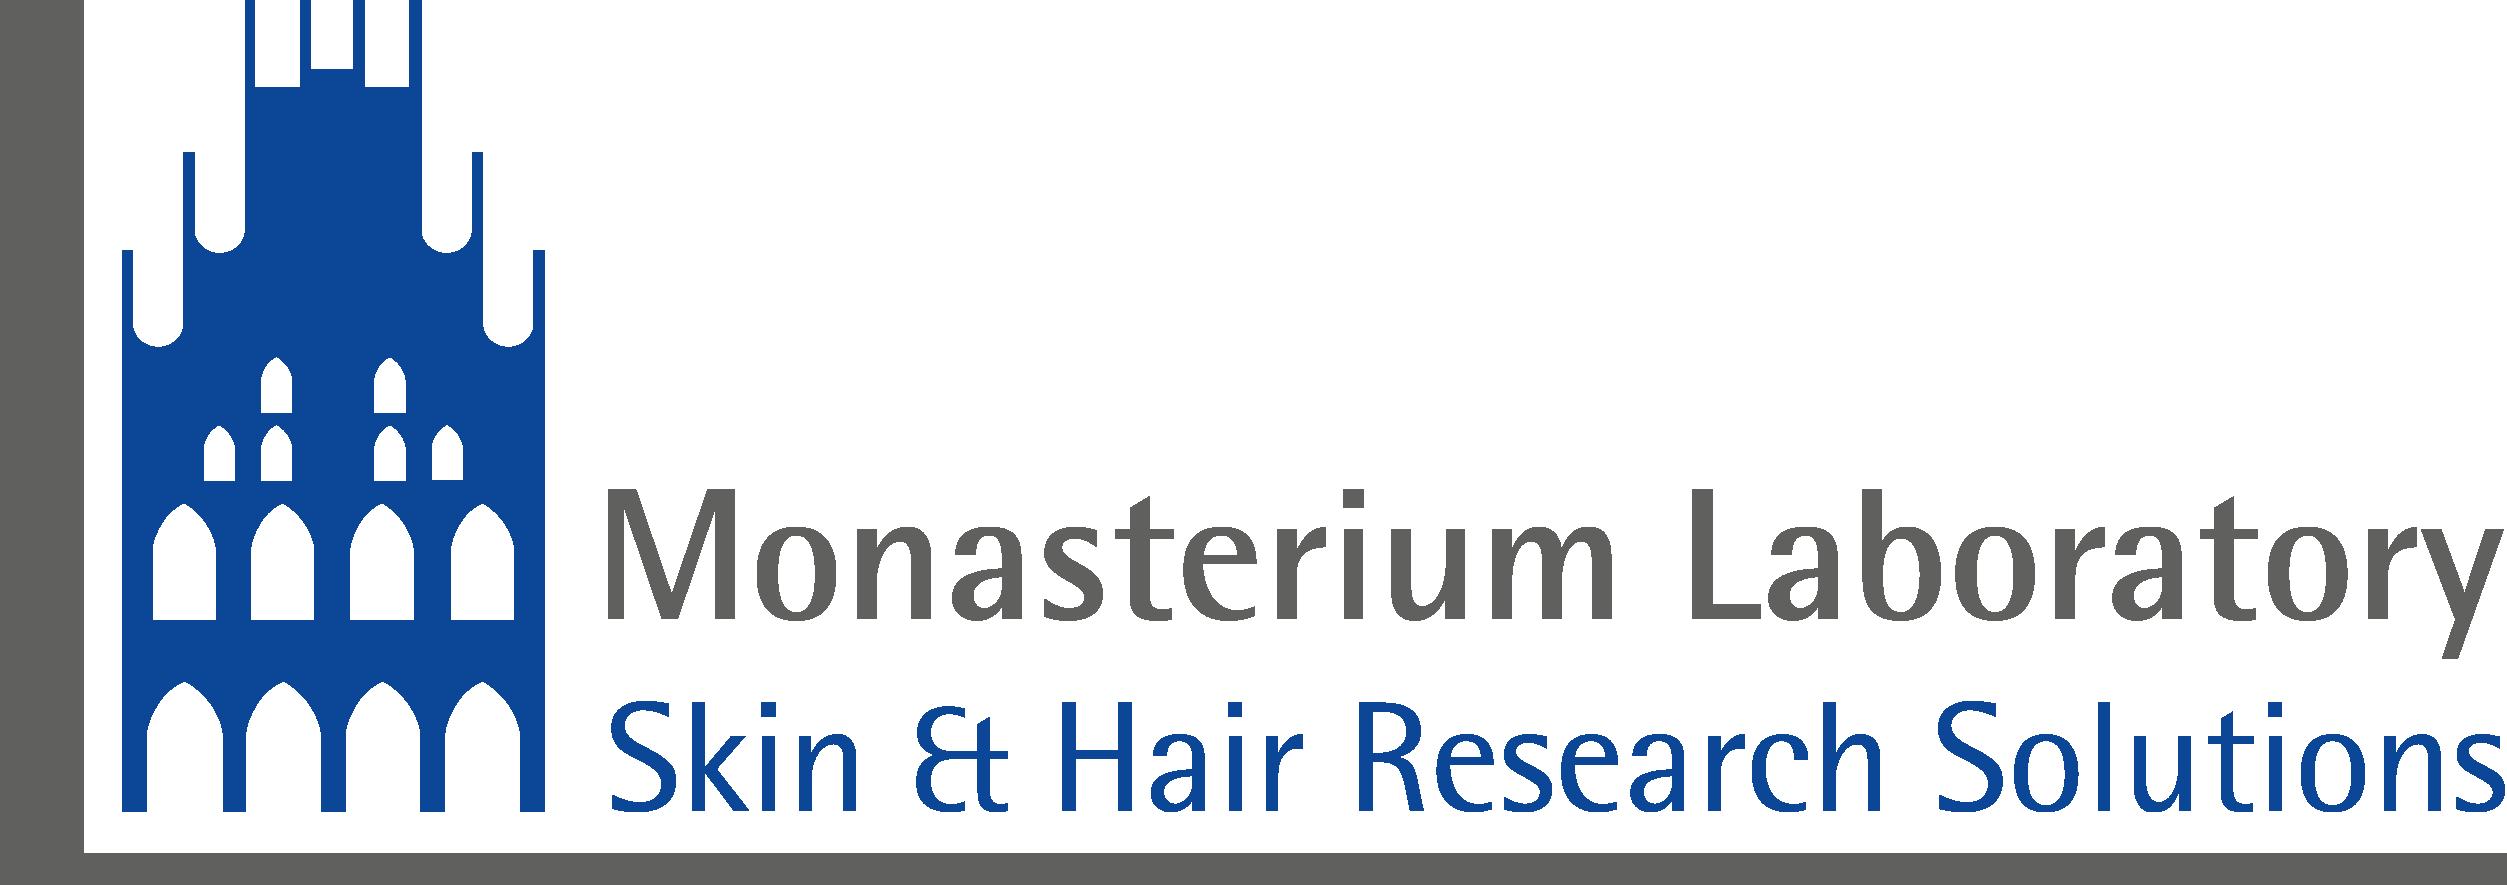 Physician Liaison, Biobanking & Ethics Officer (m/w/d) - Monasterium Laboratory GmbH - Logo